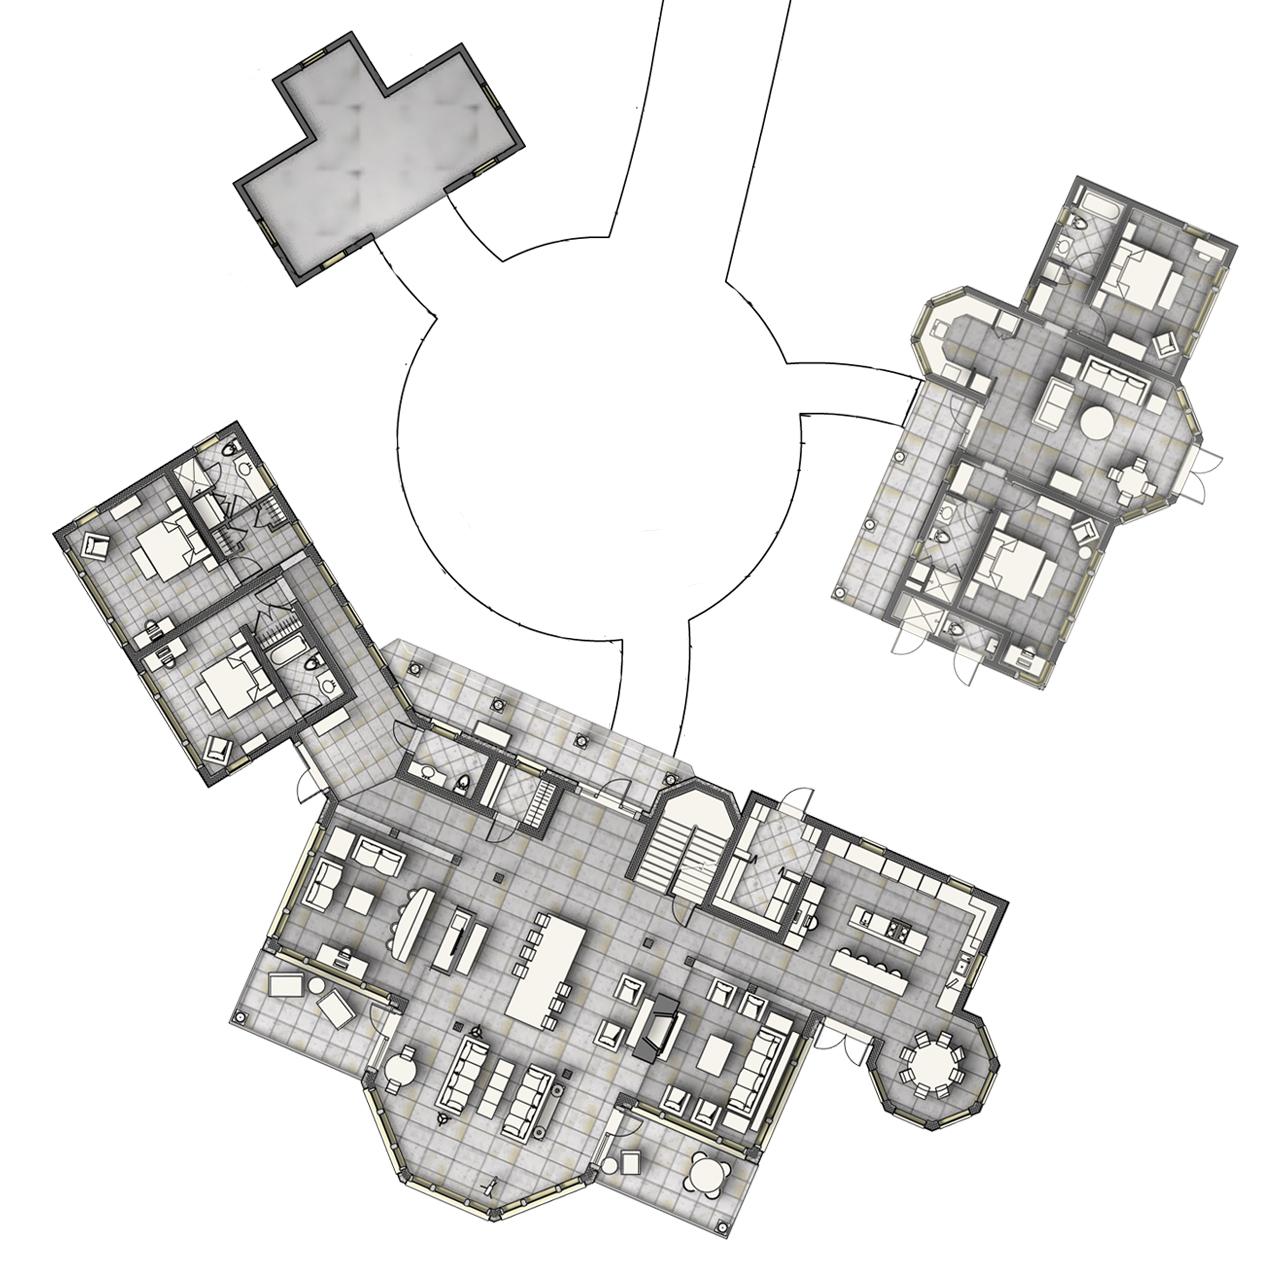 Beachfront Estate Bahamas Site Plan by HDS Architecture